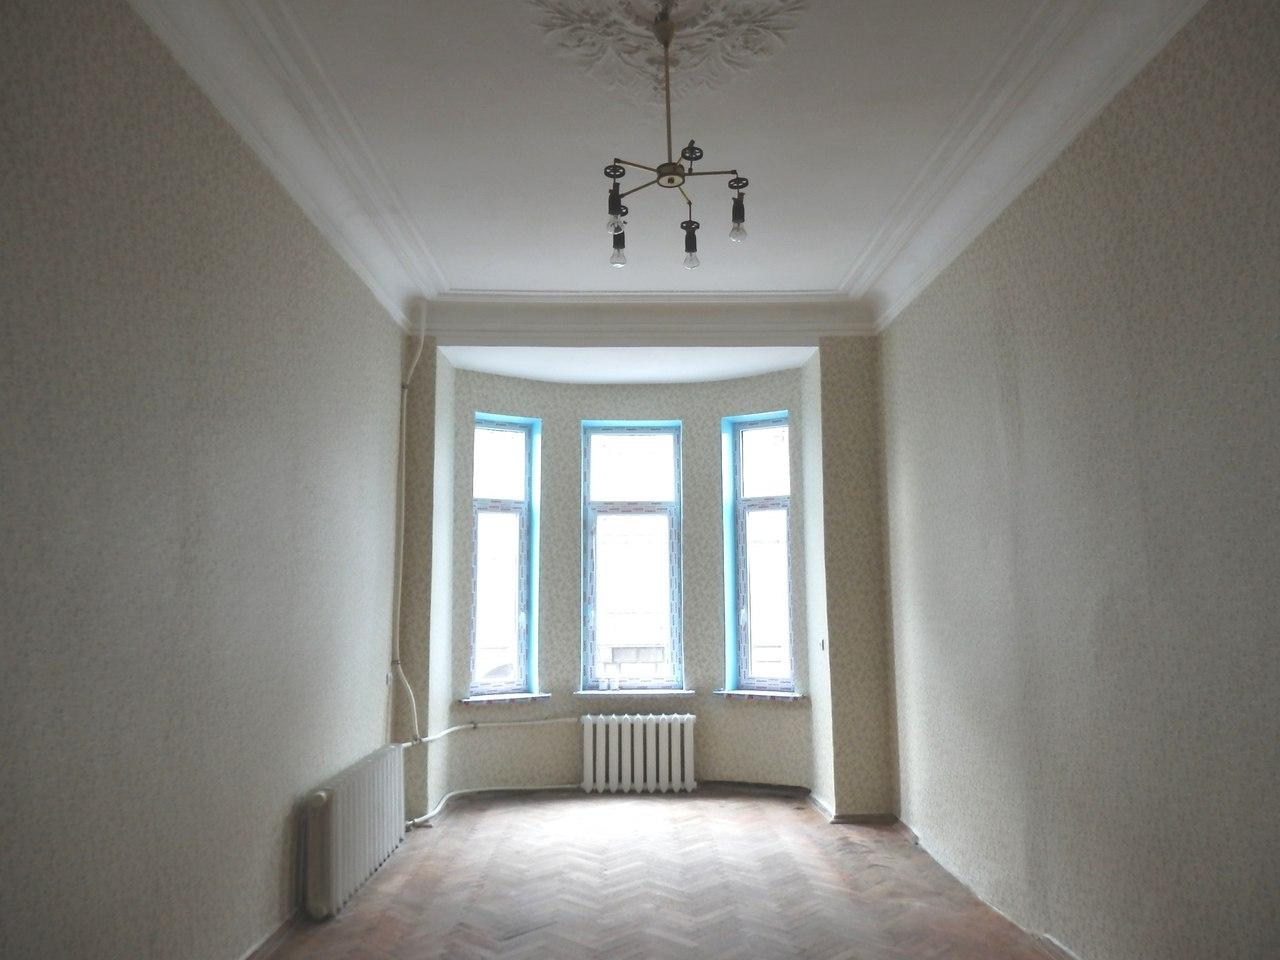 Продается комната 27 кв.м. в Петроградском районе X22qegzydjY